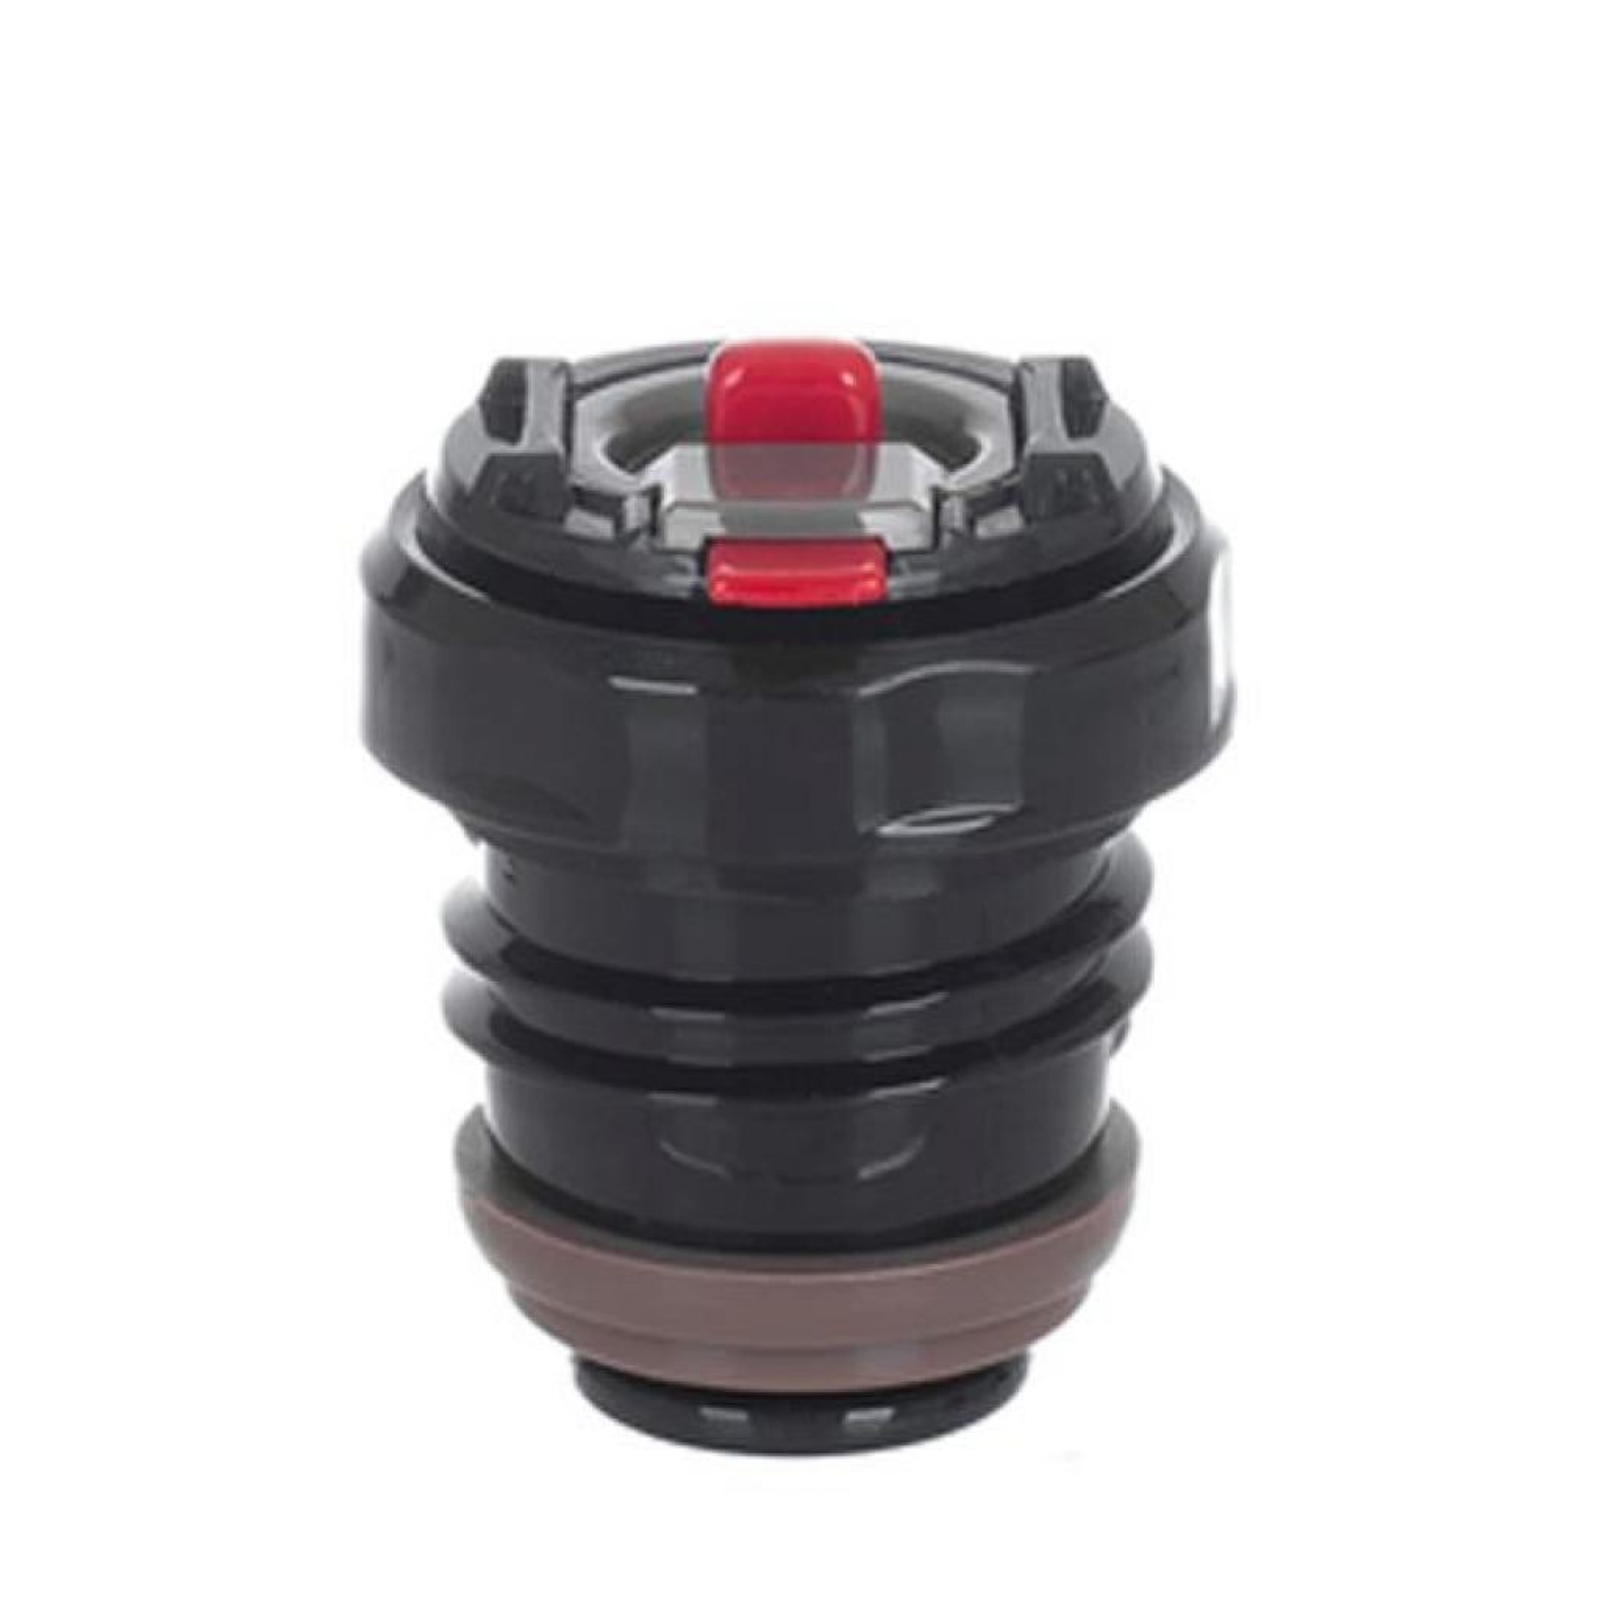 Термос Ringel Solo 0.4 L Black (RG-6101-400/2) изображение 5